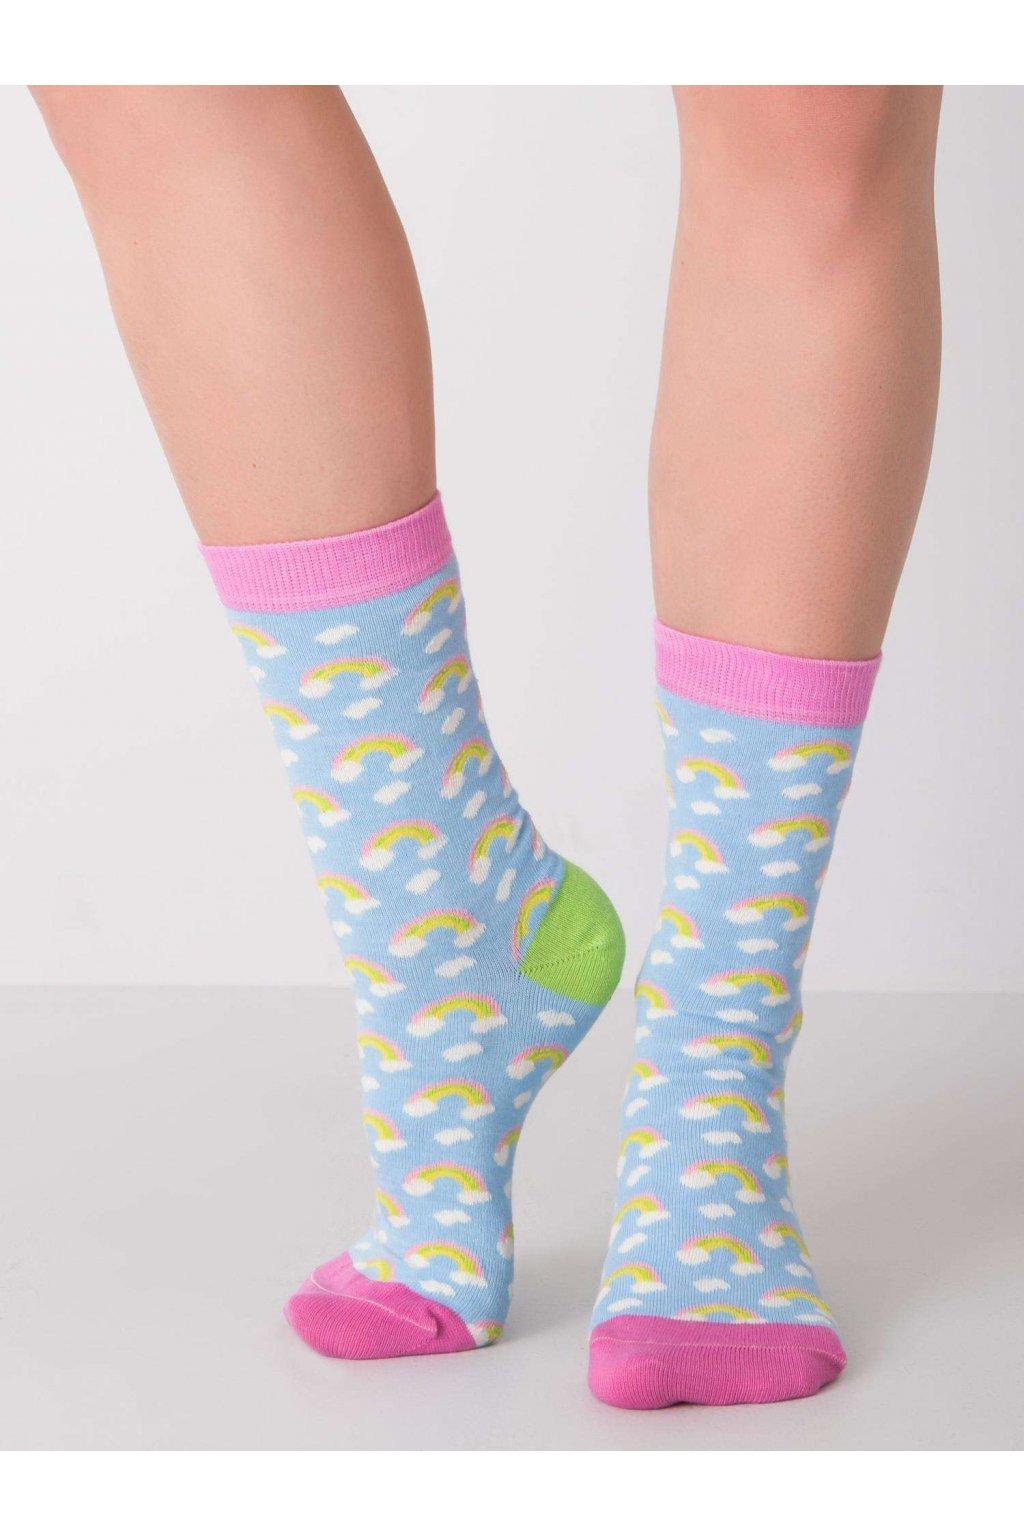 Dámske ponožky kód WS-SR-5154-1